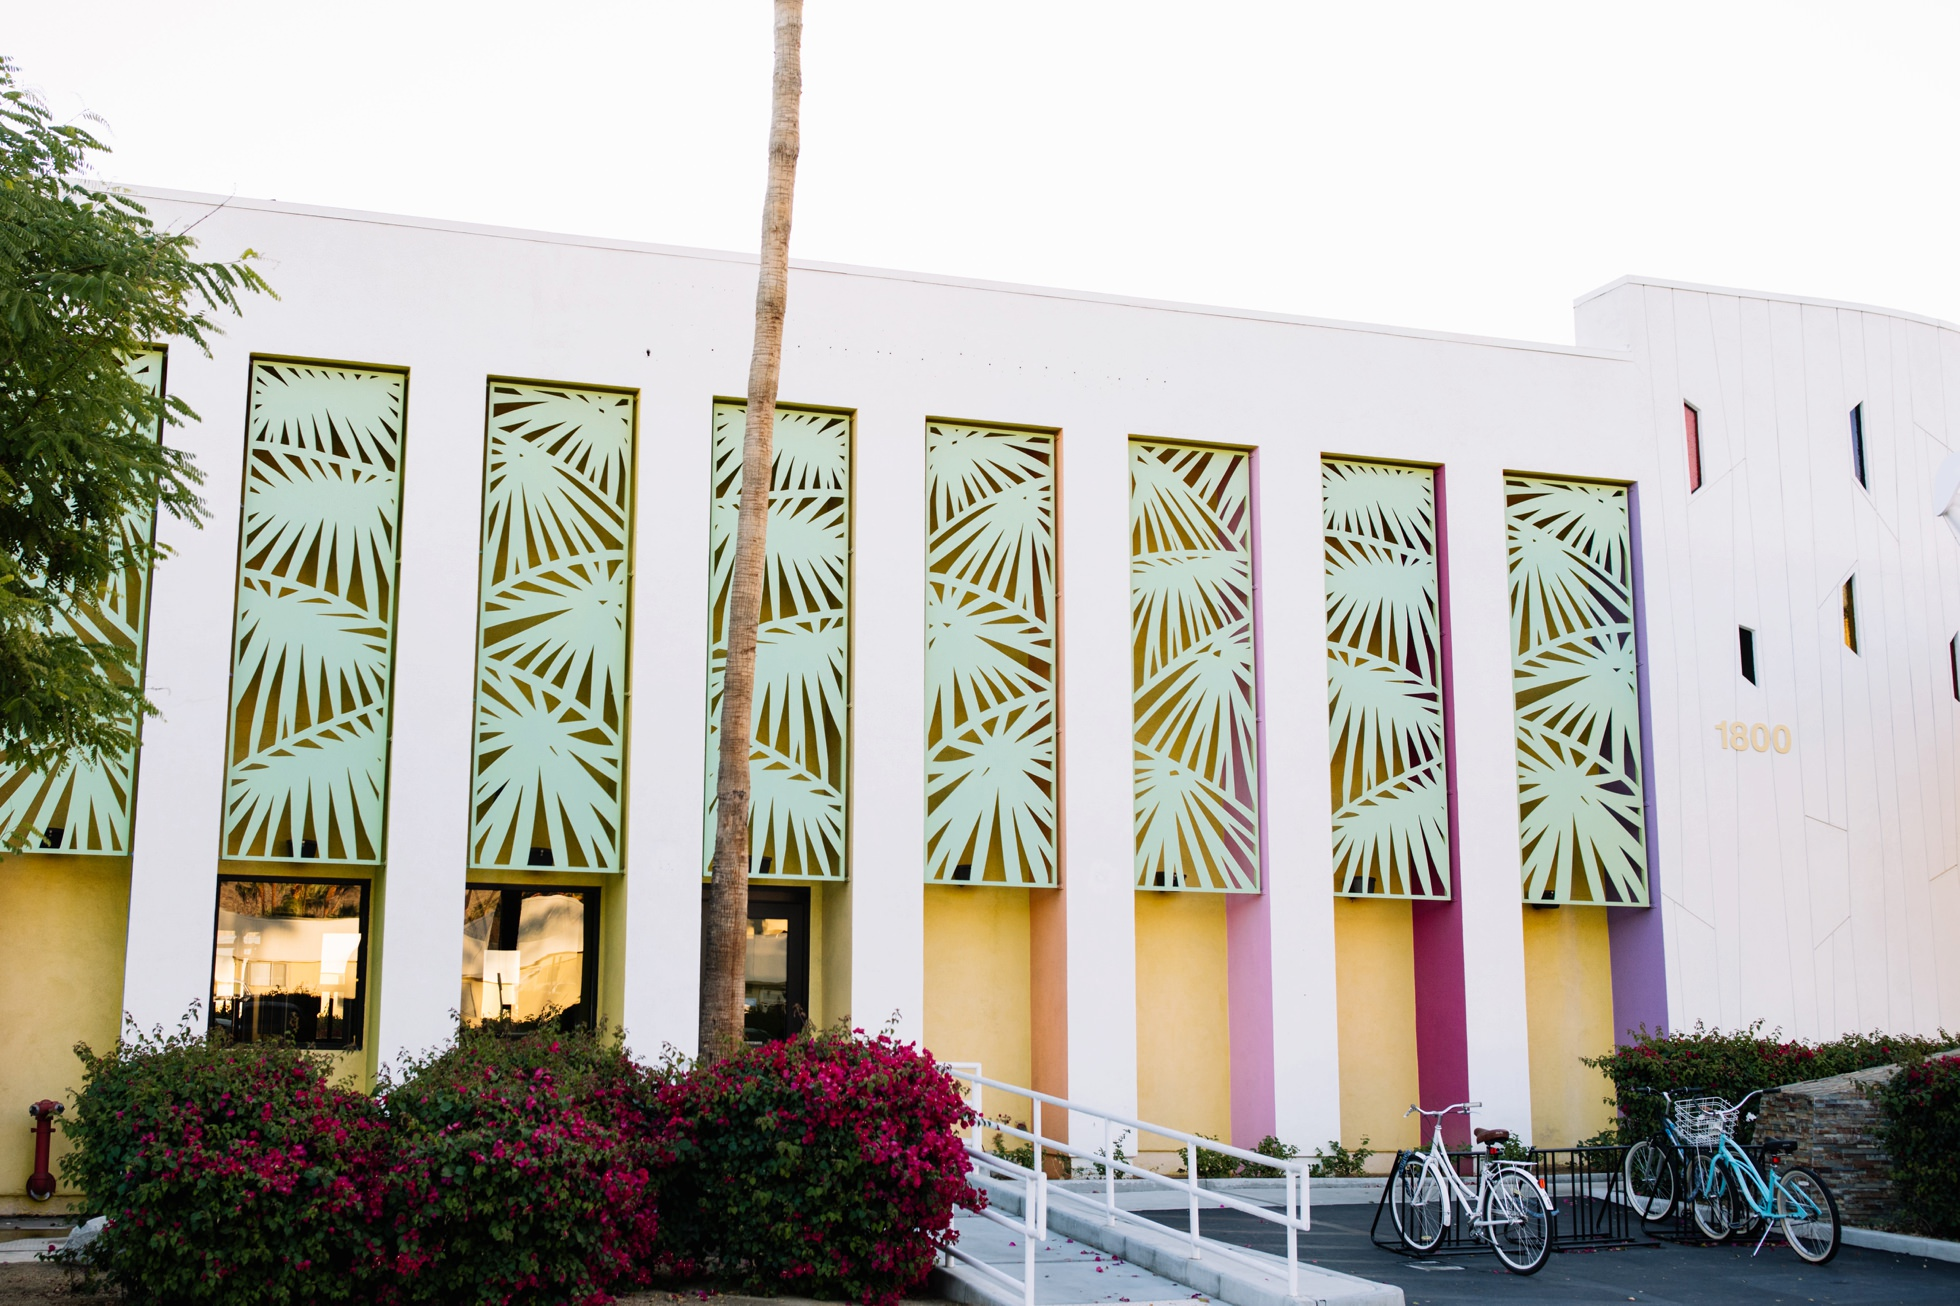 0046-saguaro-hotel-palm-springs-colorful-lodging-ca